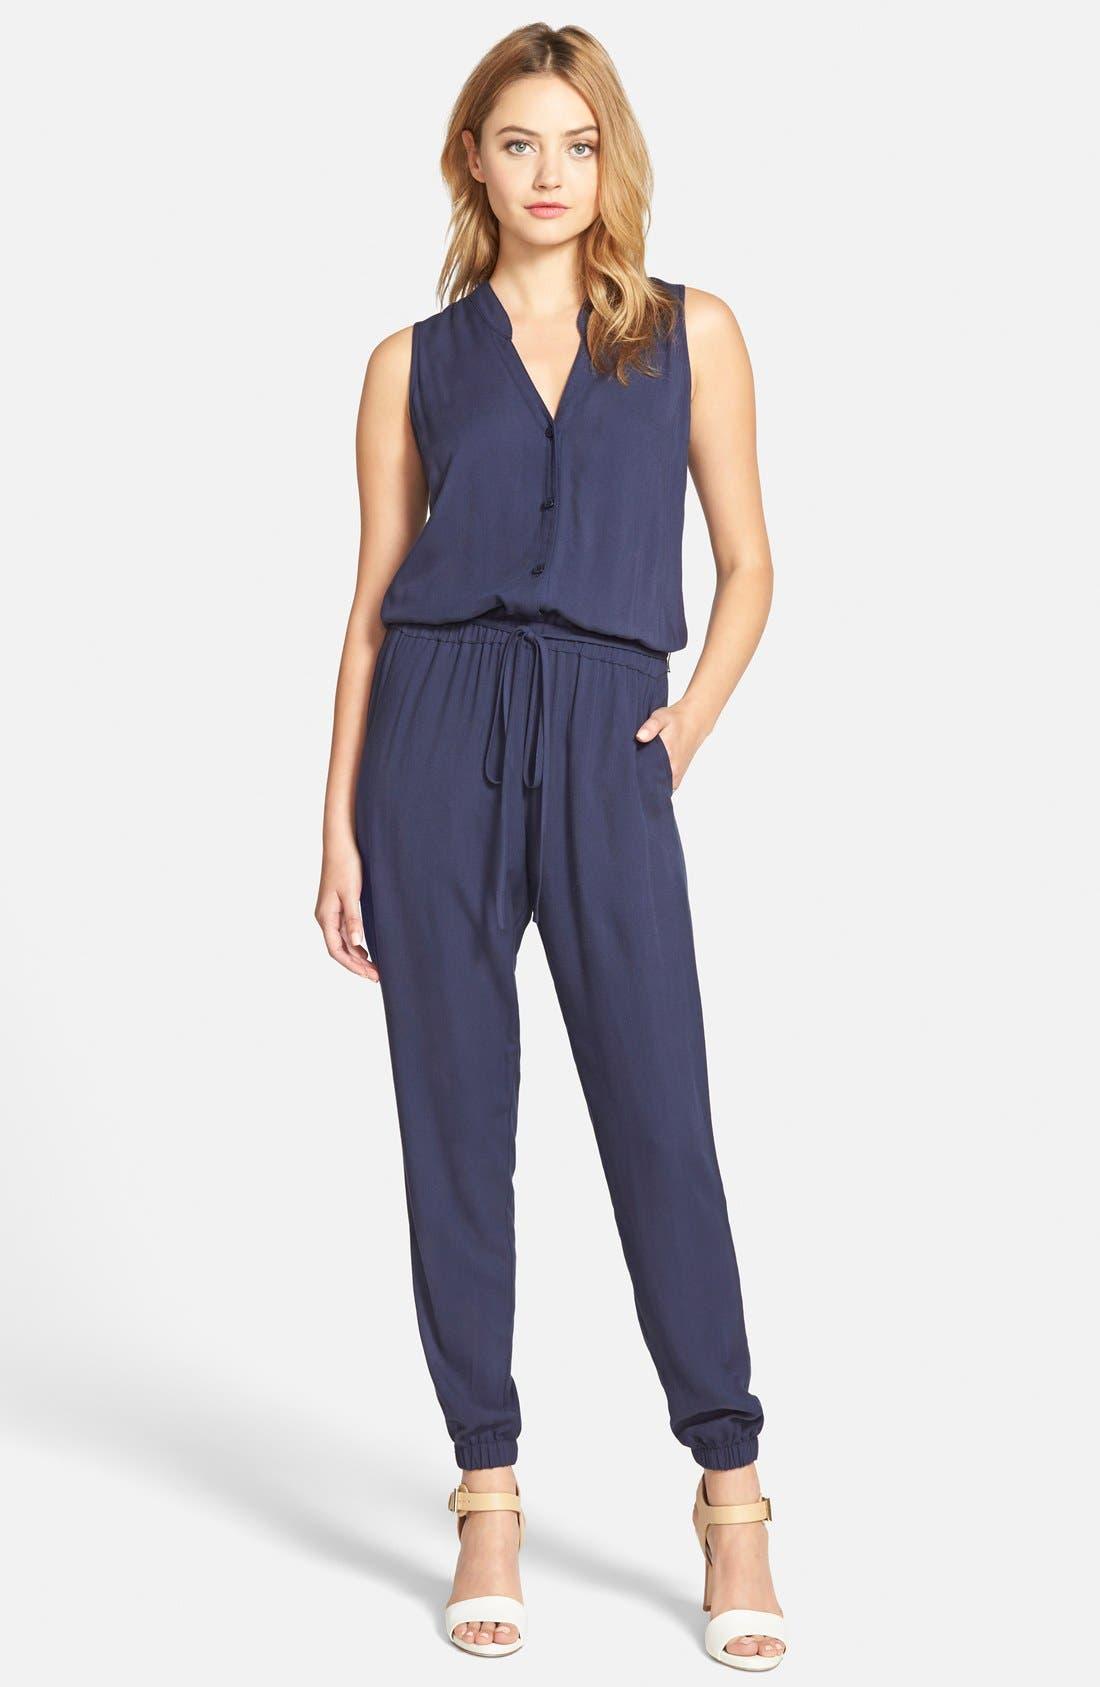 CUPCAKES AND CASHMERE 'Roxbury' Jumpsuit, Main, color, 410